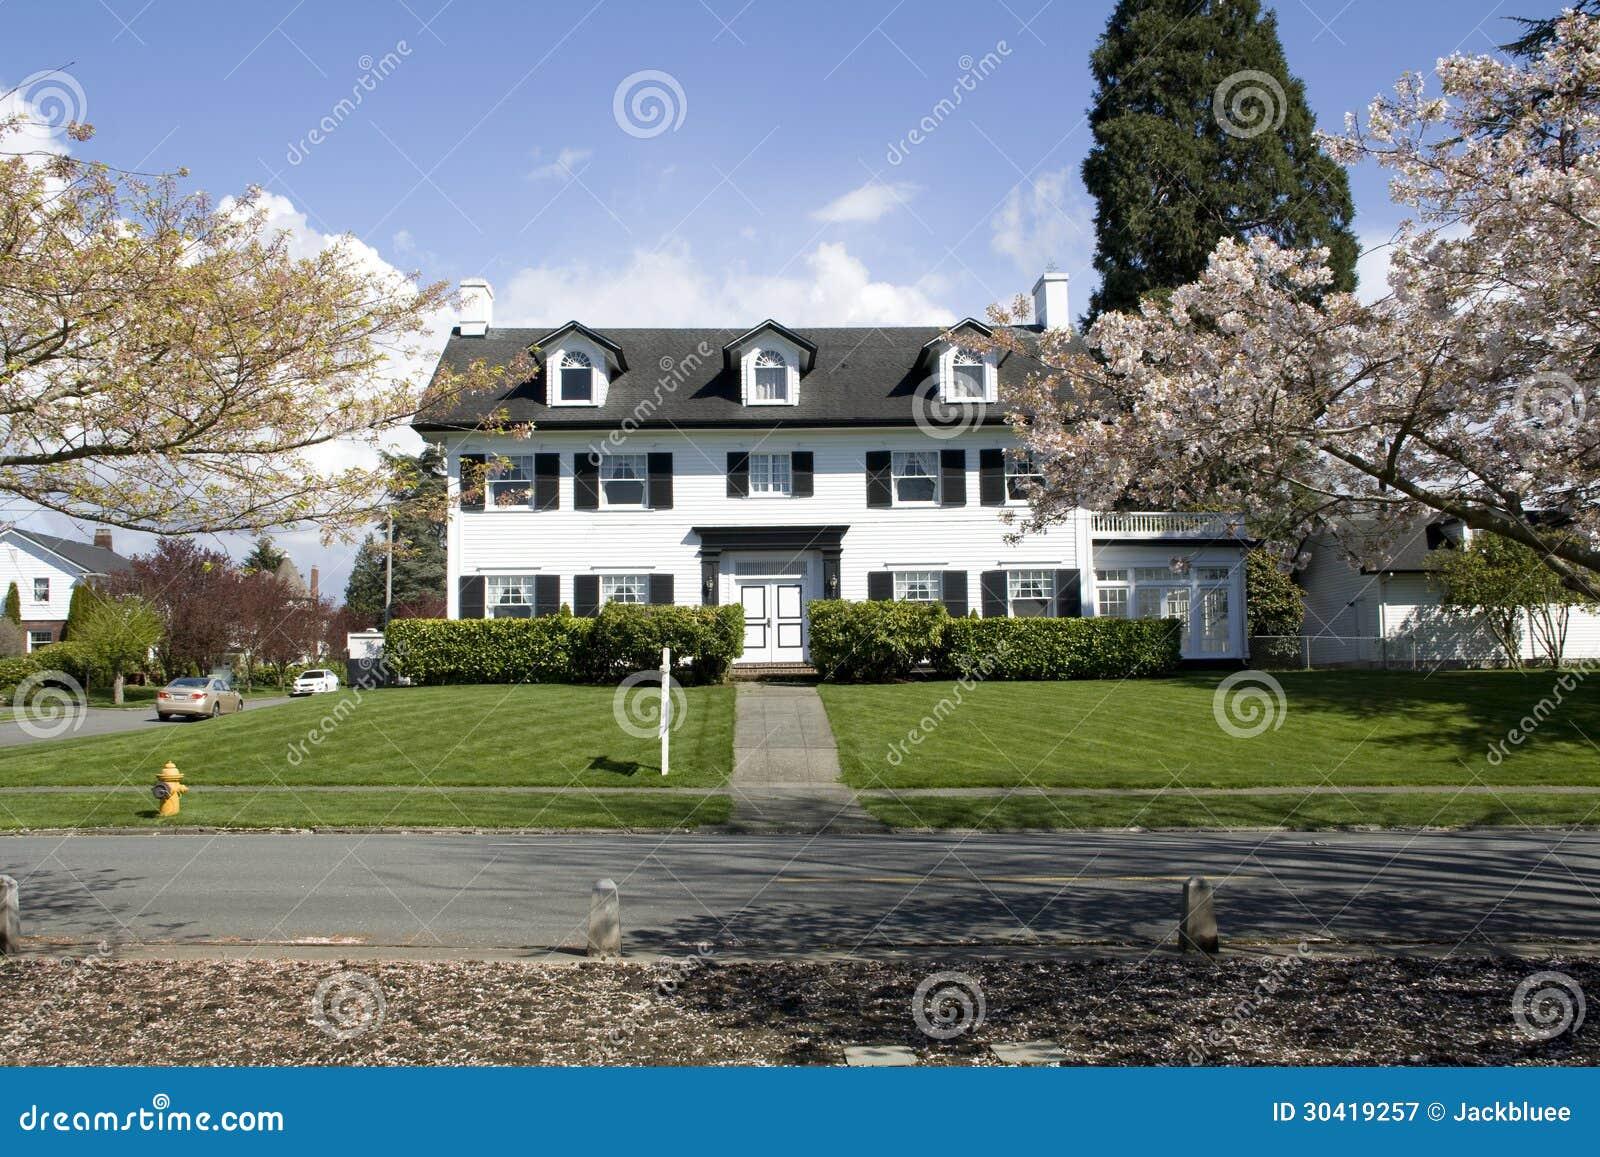 Big house with elegant designs